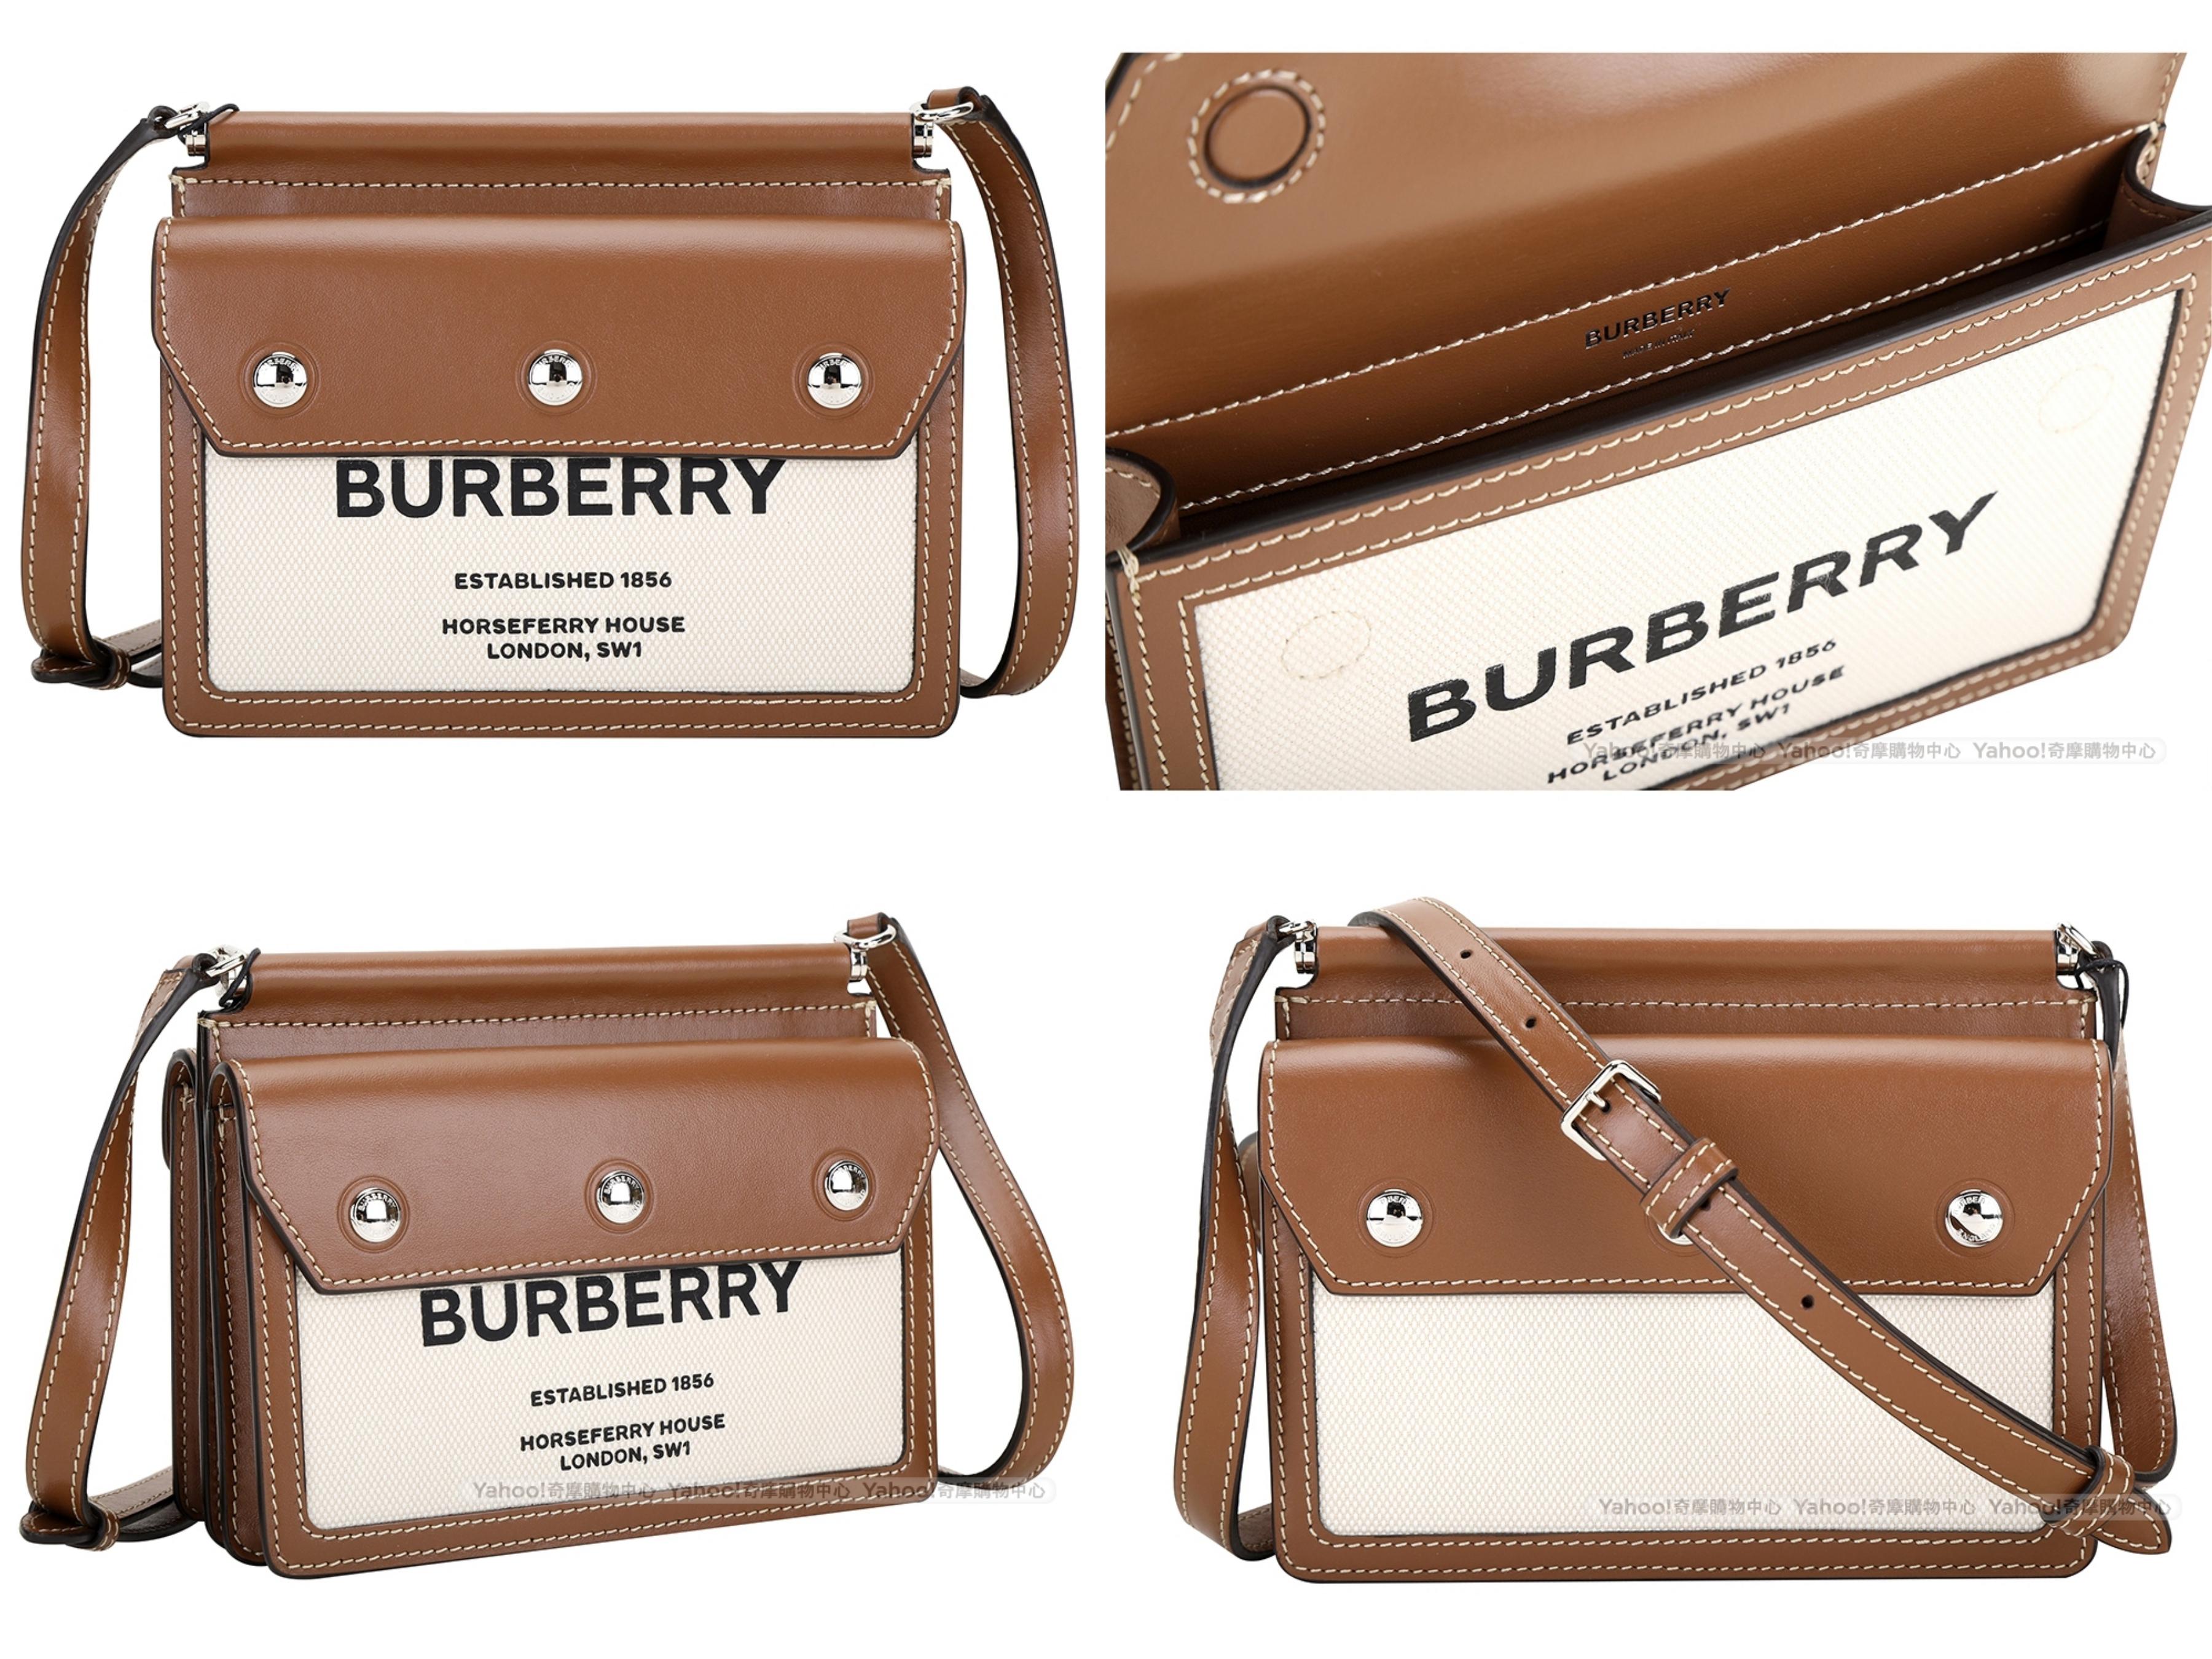 BURBERRY Horseferry Title 字母印花口袋細節泰爾勒斜背包(自然色x麥芽棕) 優雅簡約不失設計感,高實用價值雙層收納出門隨身物